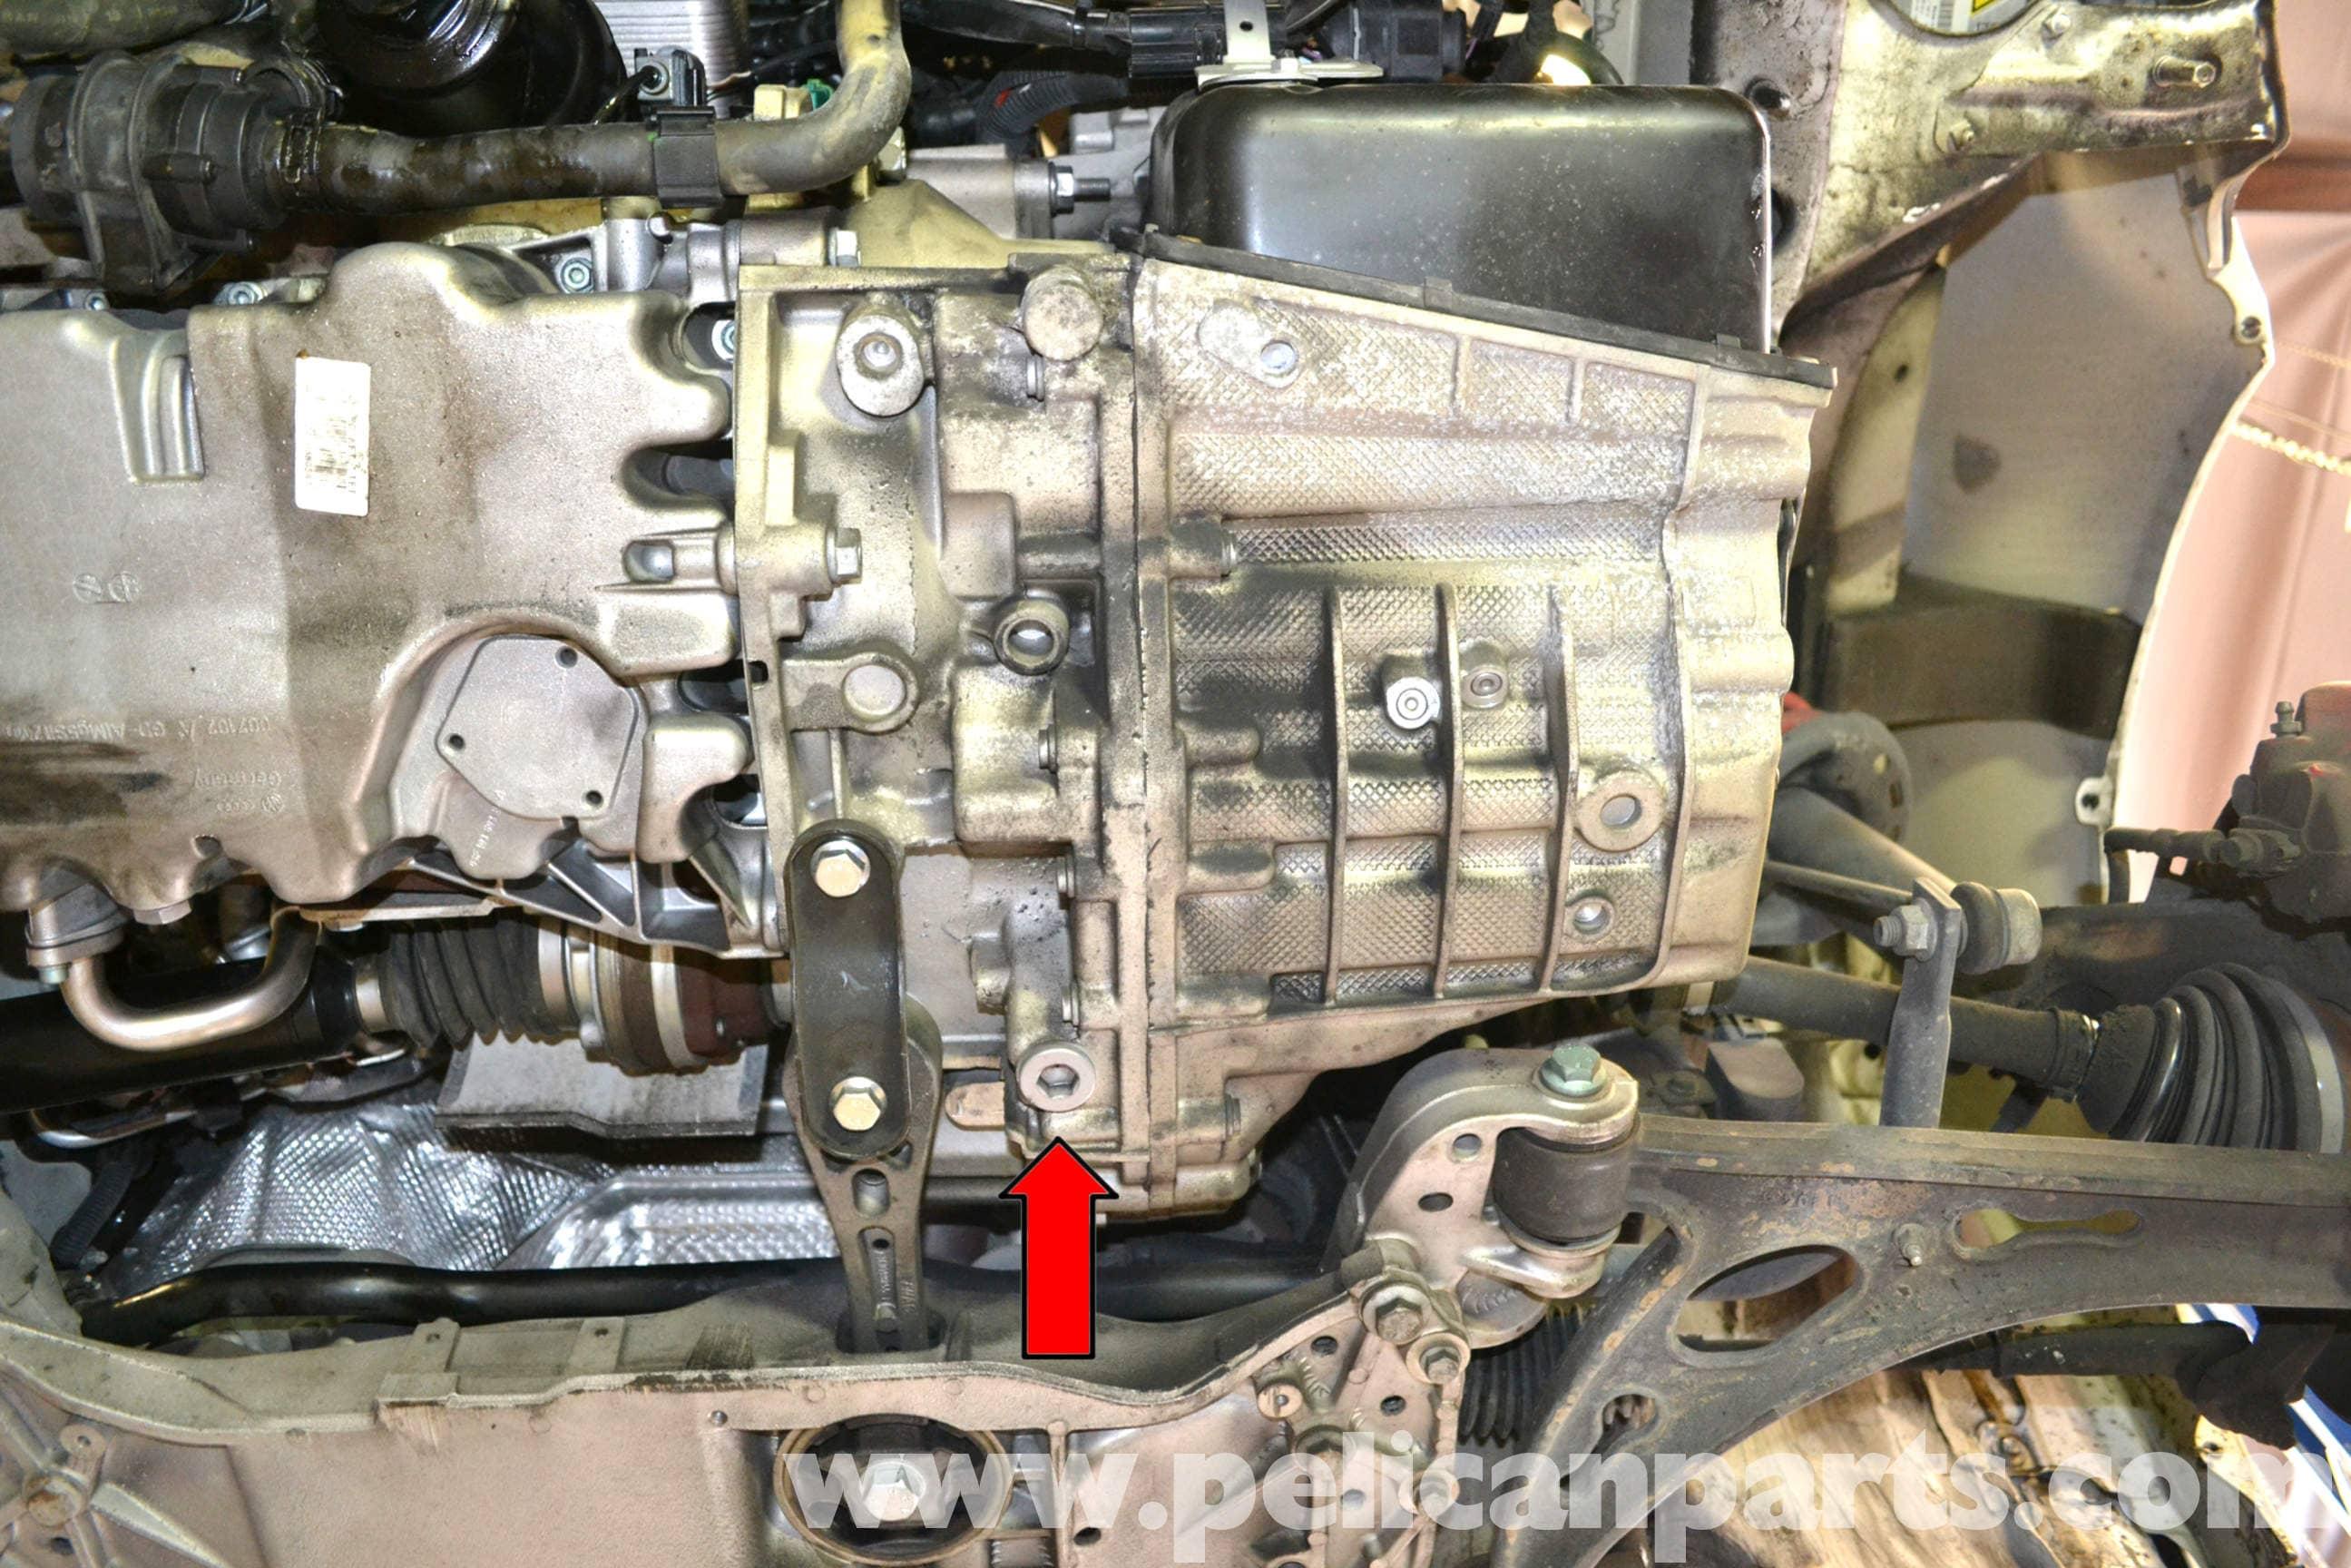 Volkswagen Golf Gti Mk V Dsg Transmission Oil And Filter Replacement Beetle Engine Coolant Drain Plug Large Image Extra